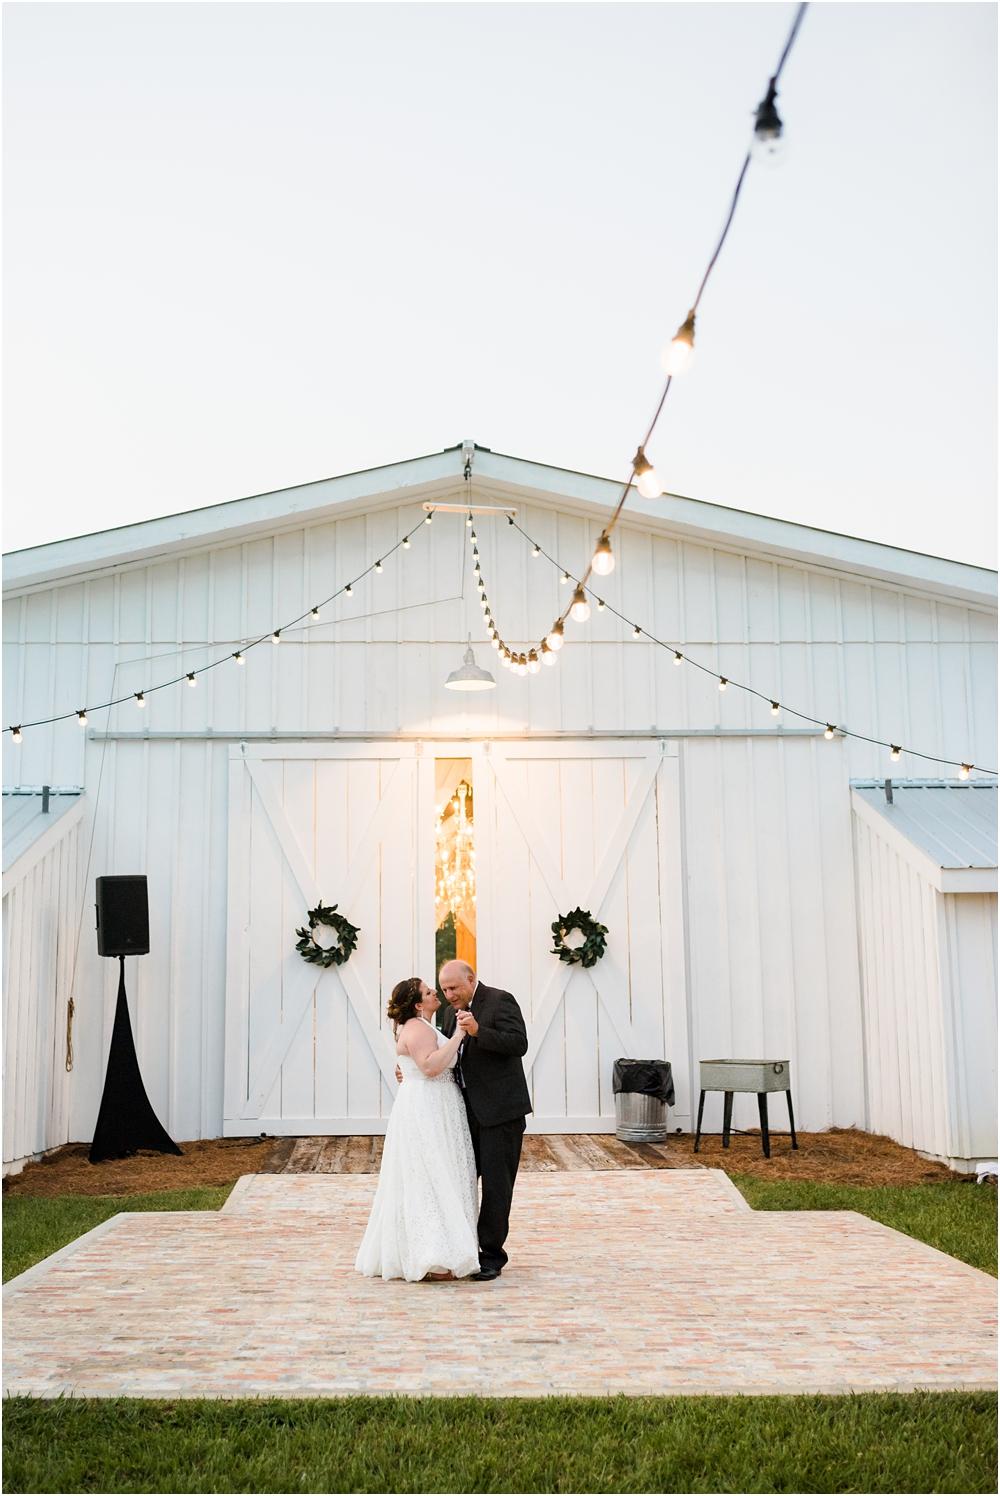 mosley-wedding-kiersten-stevenson-photography-30a-panama-city-beach-dothan-tallahassee-(367-of-472).JPG